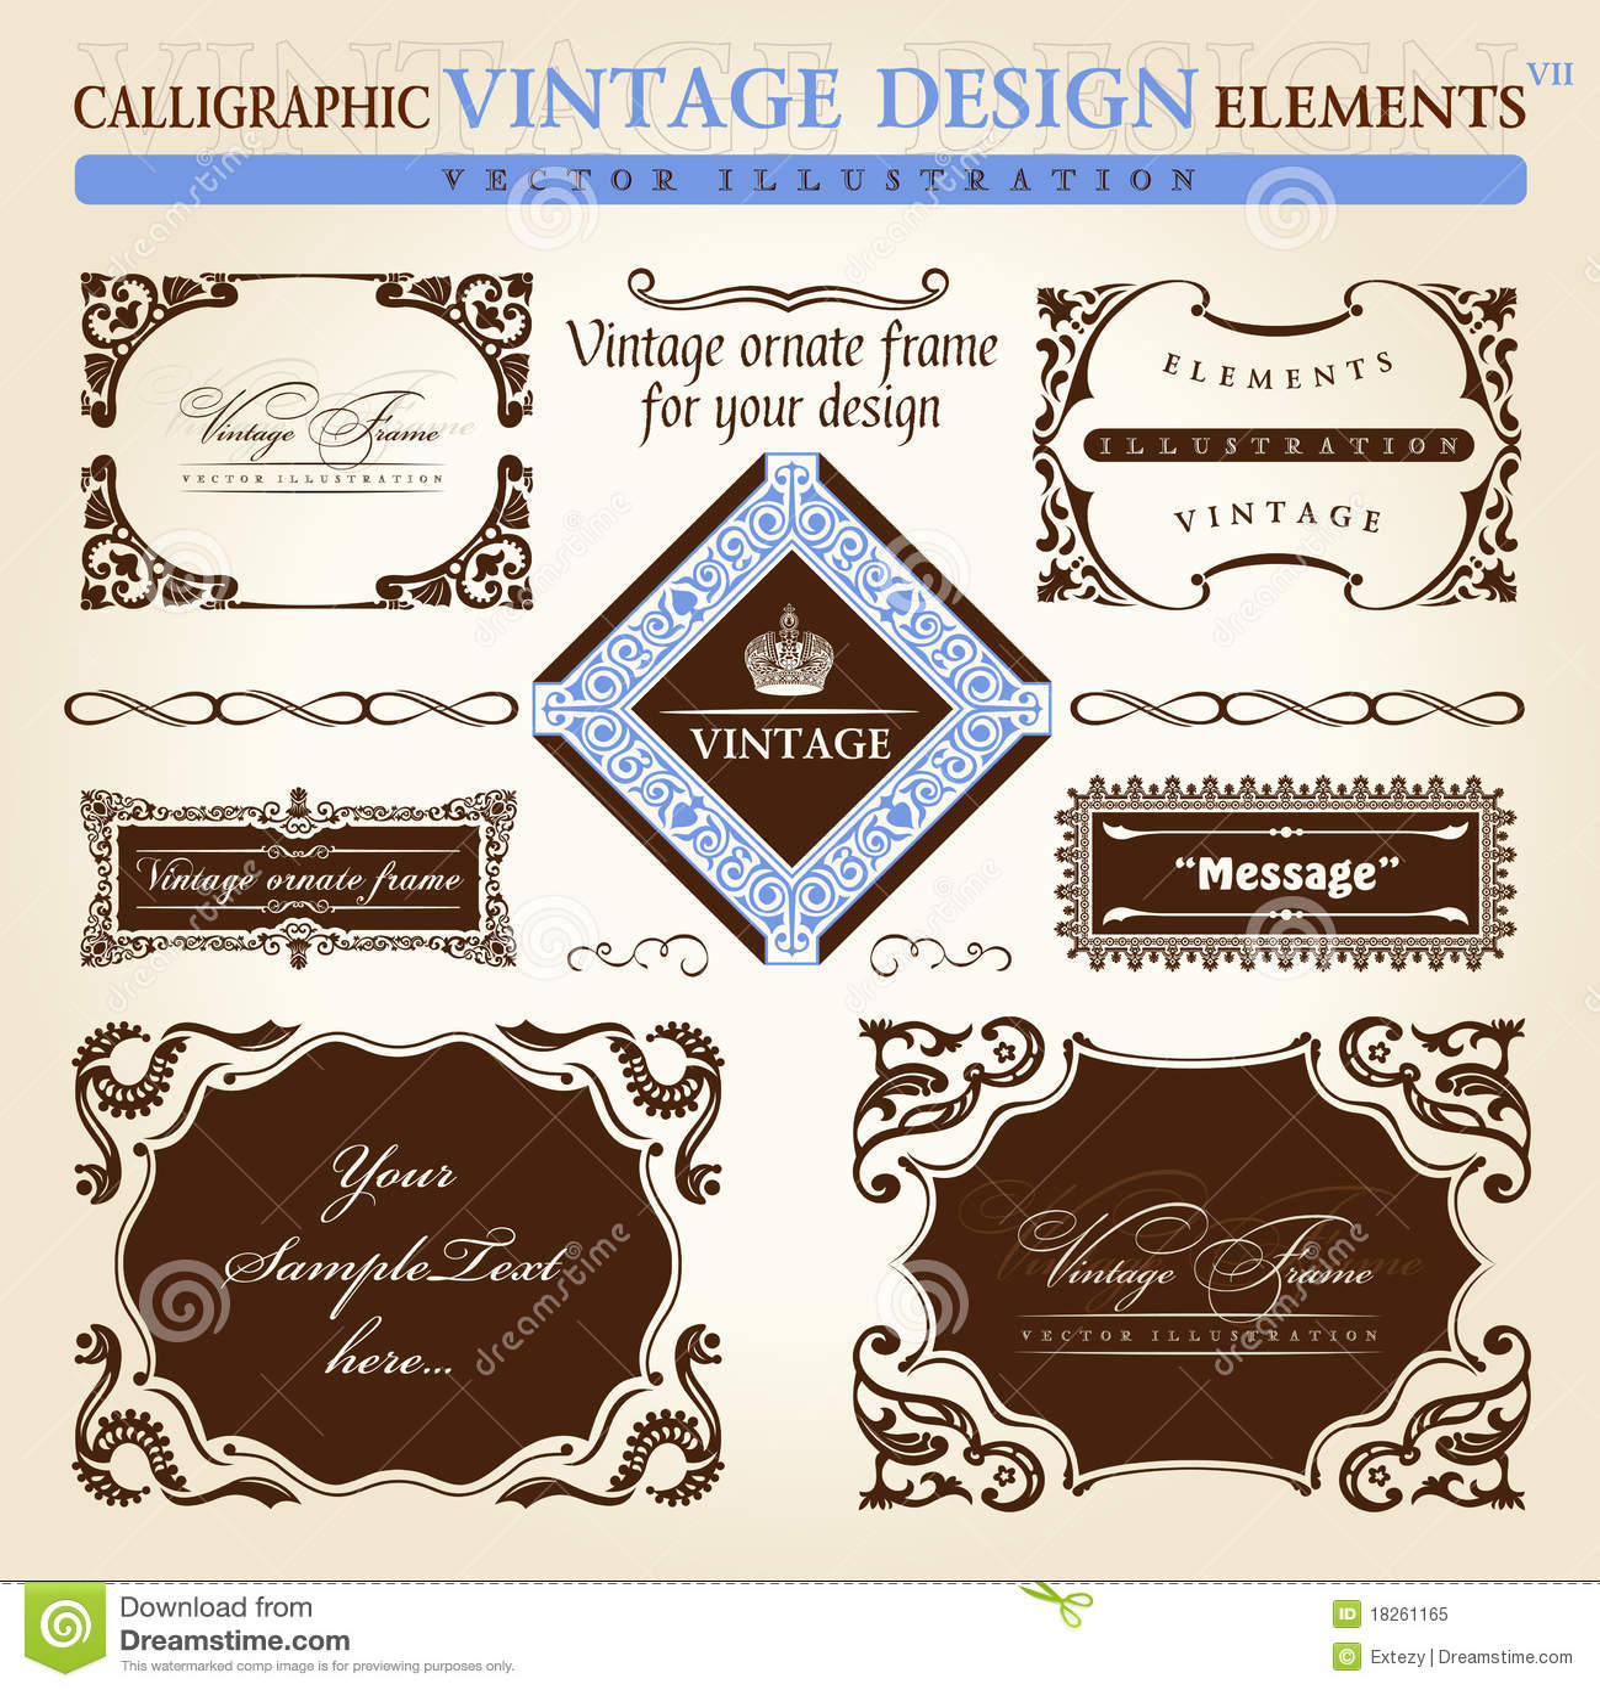 Download free vintage ornaments vintage ornaments and iders - Element Frame Ornament Set Text Vintage